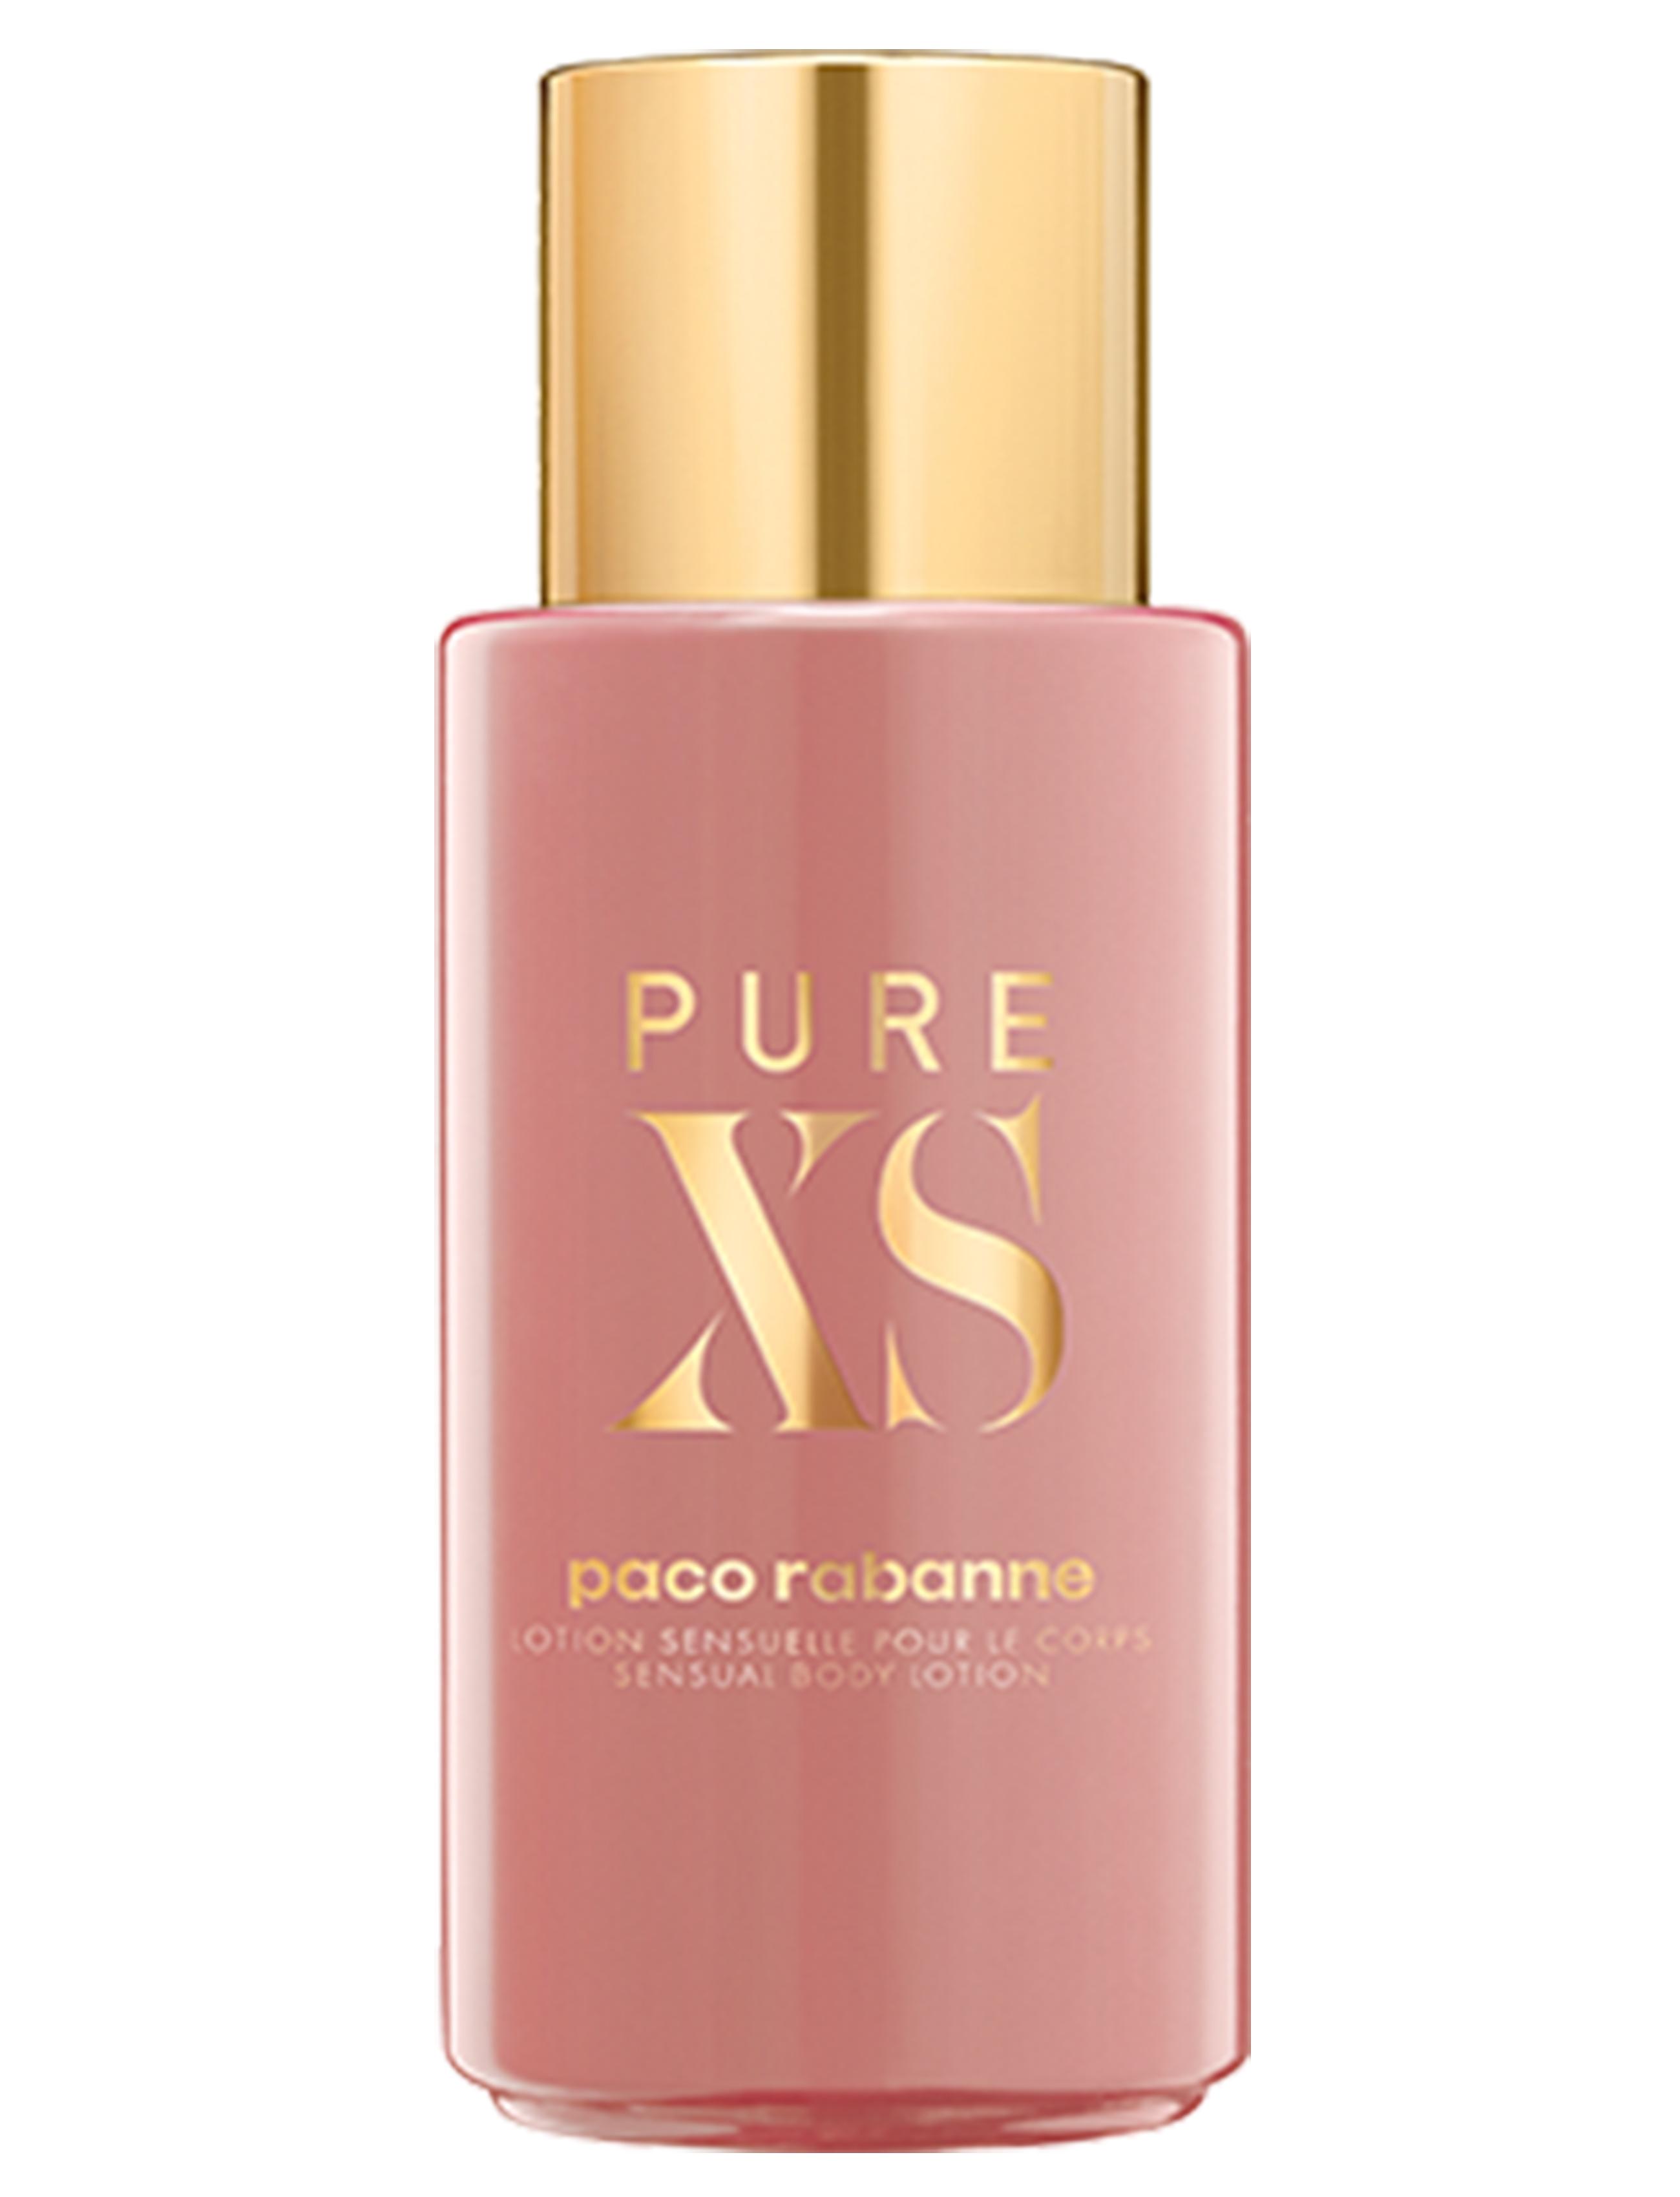 Paco Rabanne Pure Xs Femme Bodylotion, 200 ml